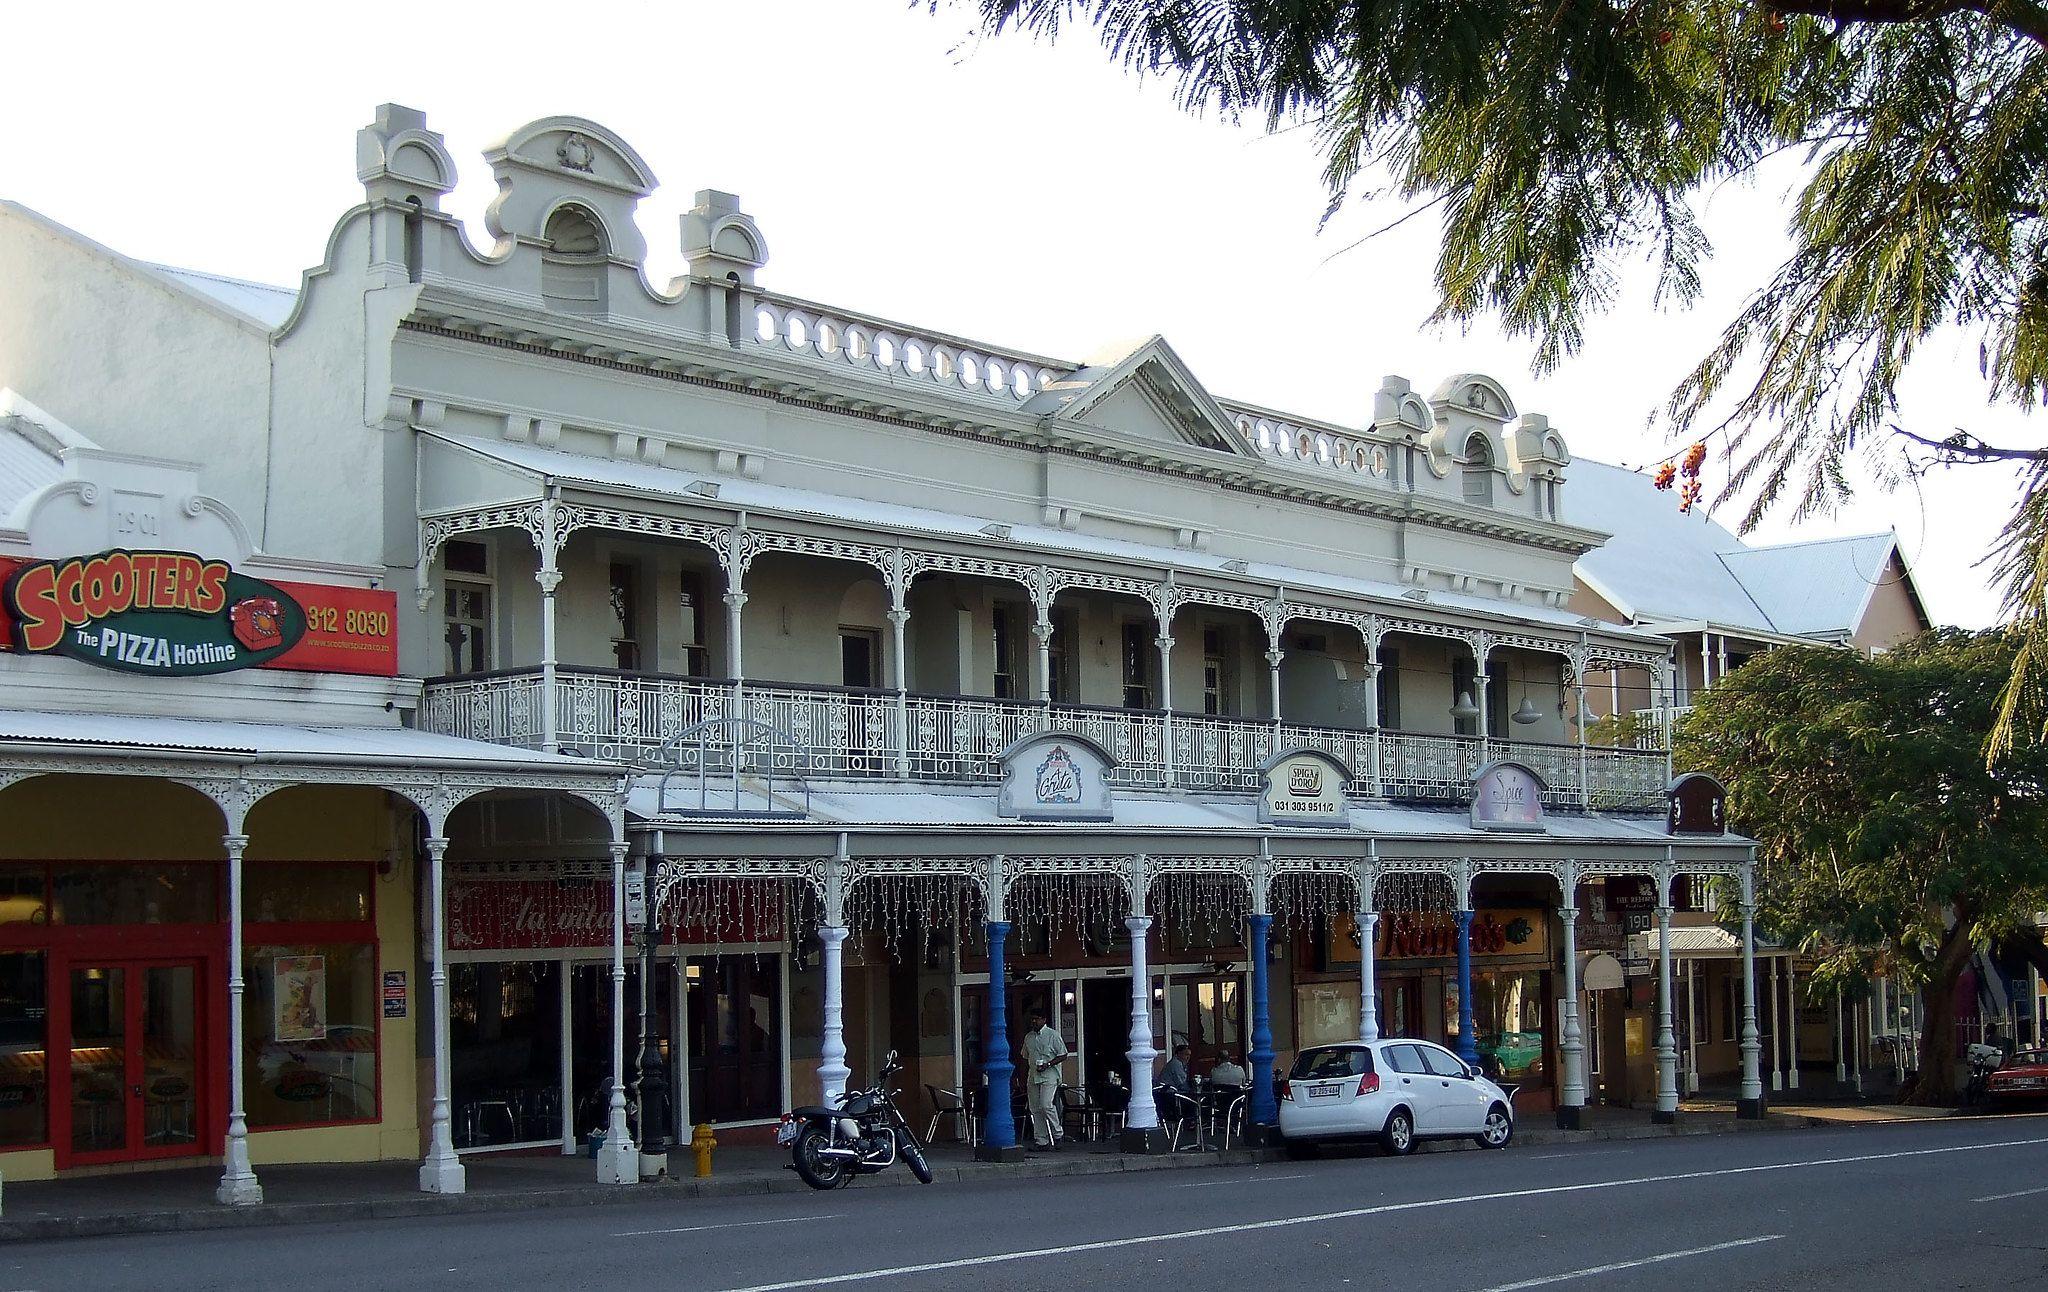 Florida Road Durban South Africa